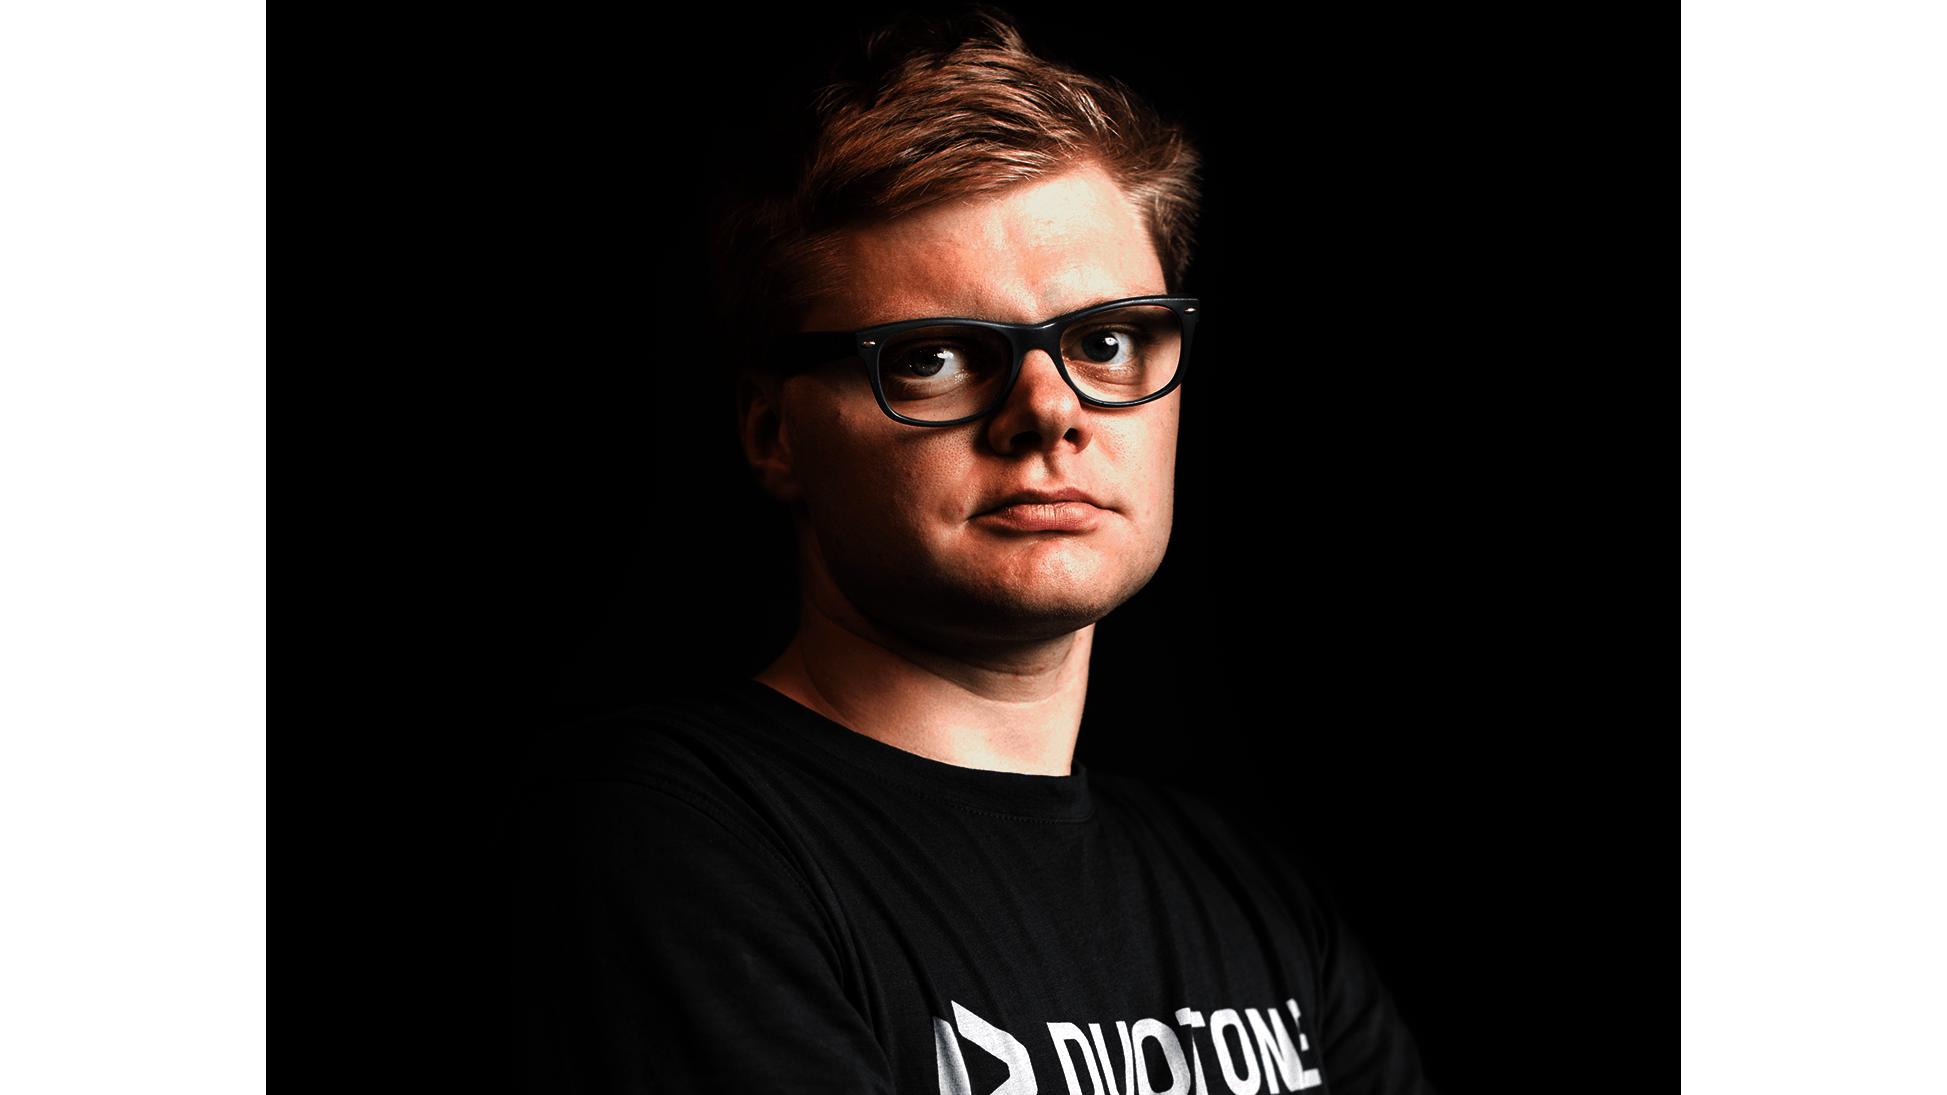 Duotone_Kitebarding_Interview_Spirit_Foil_Max_Pajank